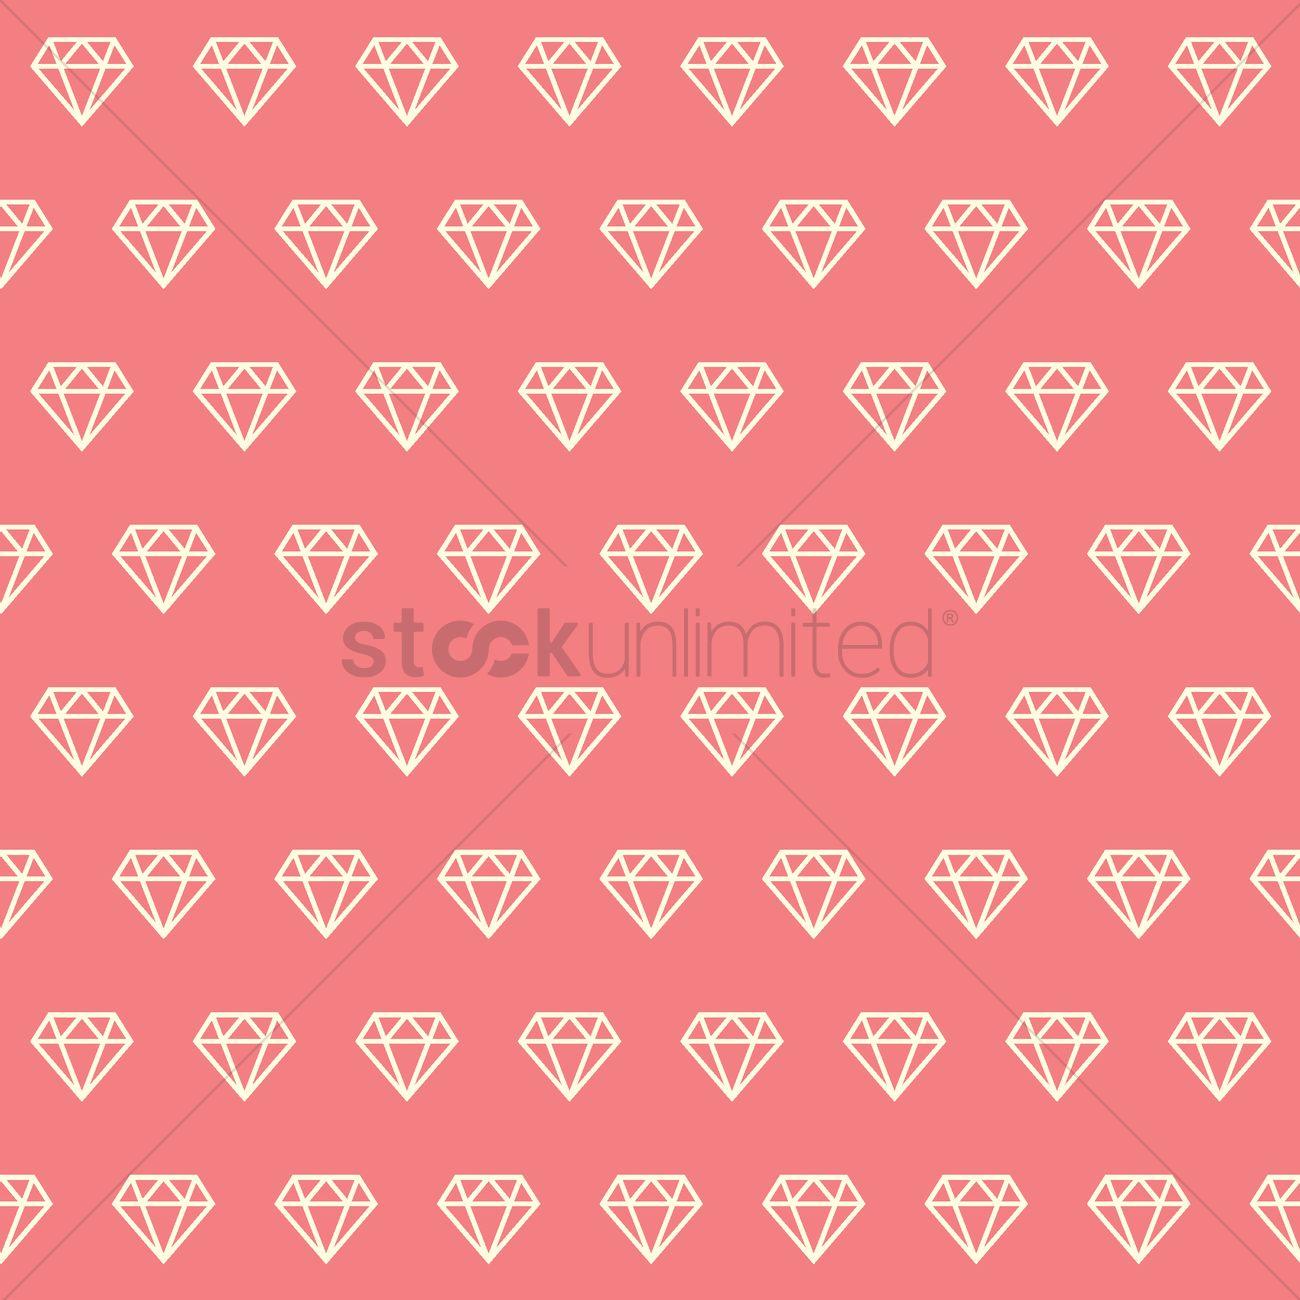 Diamond background Vector Image - 1541460 | StockUnlimited